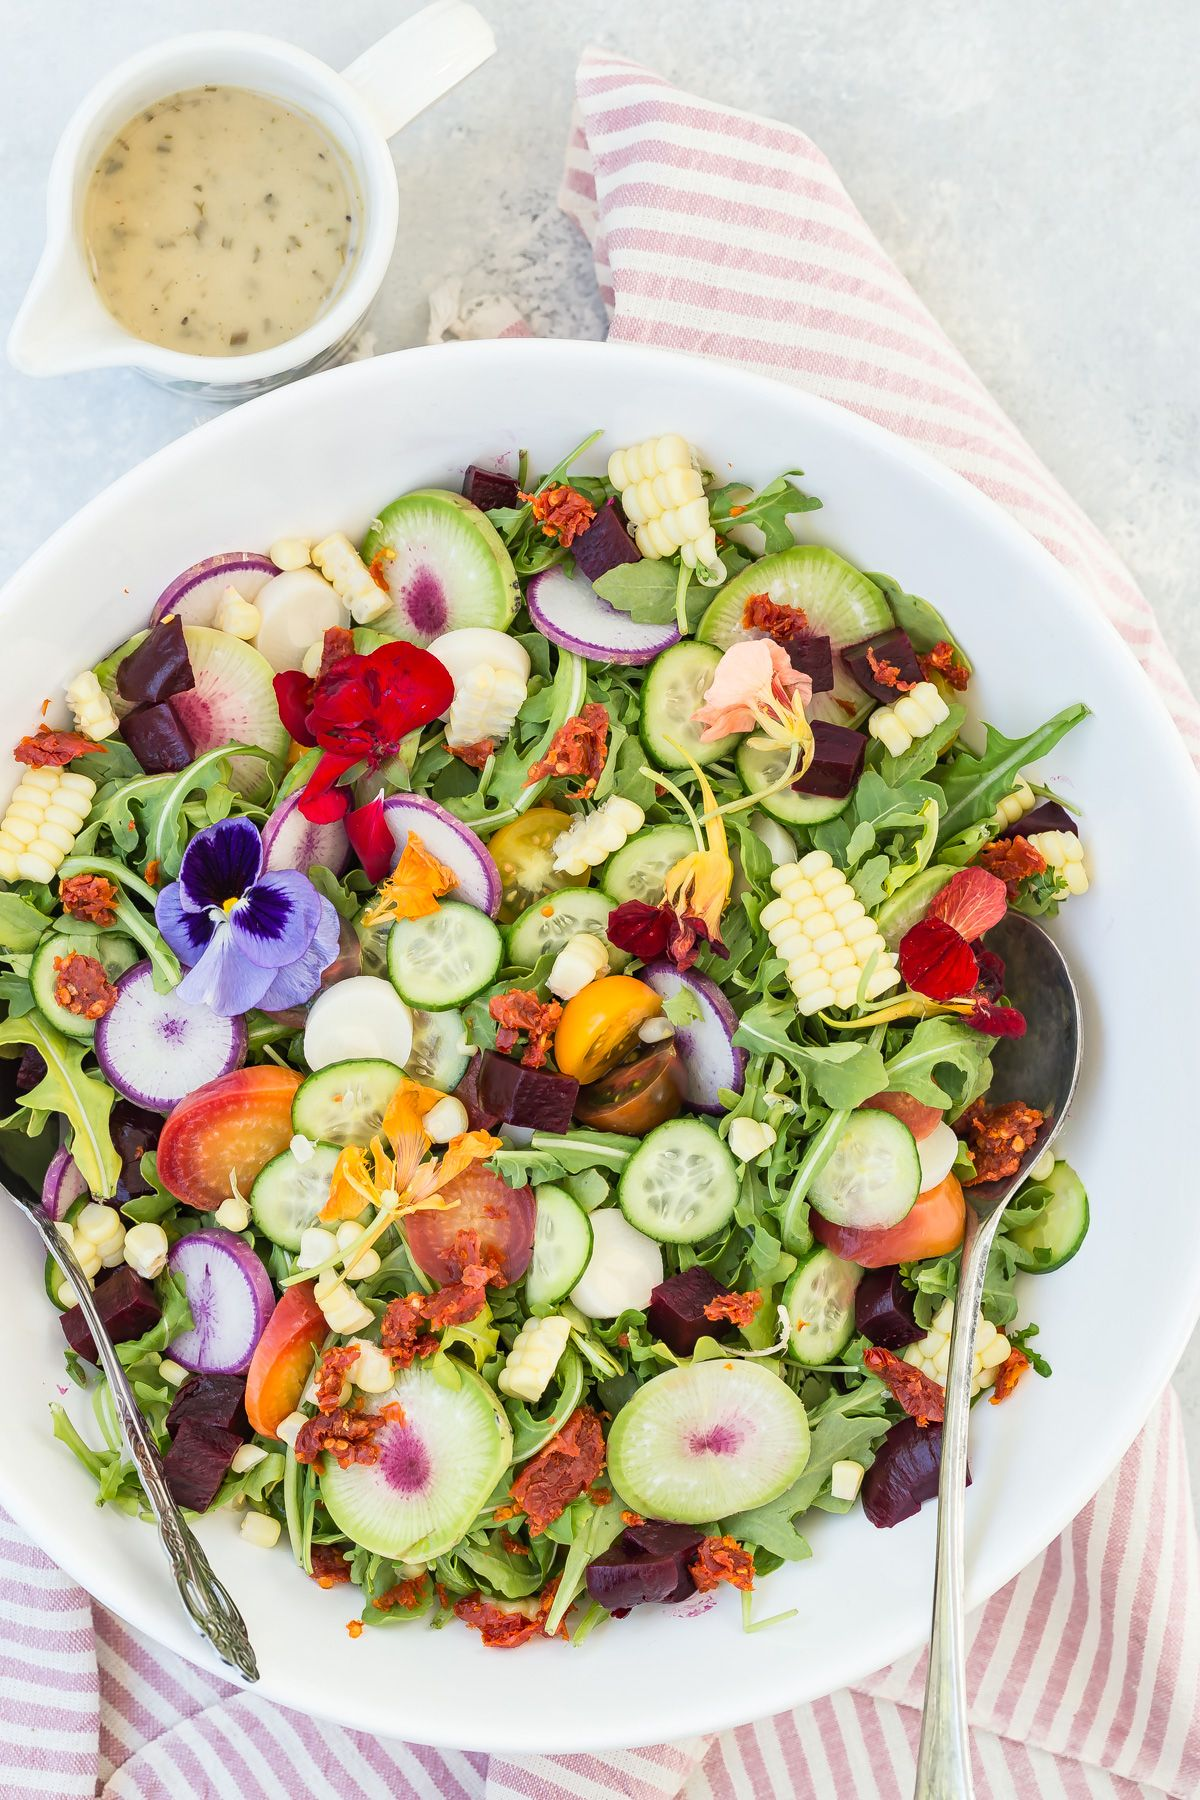 Summer Garden Salad Weelicious Recipe Best Salad Recipes Weelicious Recipes Salad Recipes For Dinner